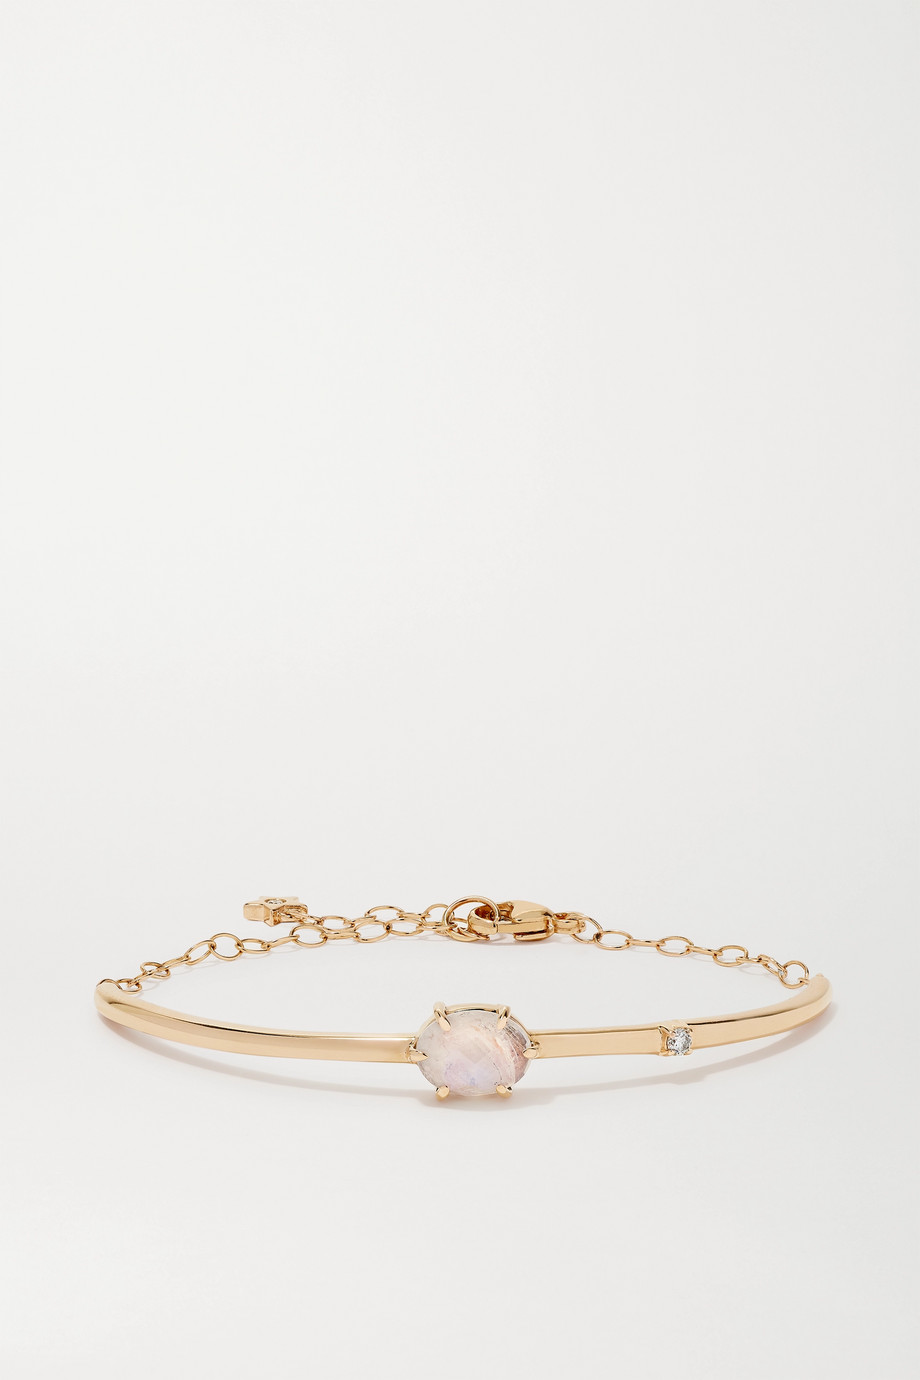 Andrea Fohrman Mini Cosmo 14-karat gold, moonstone and diamond bracelet